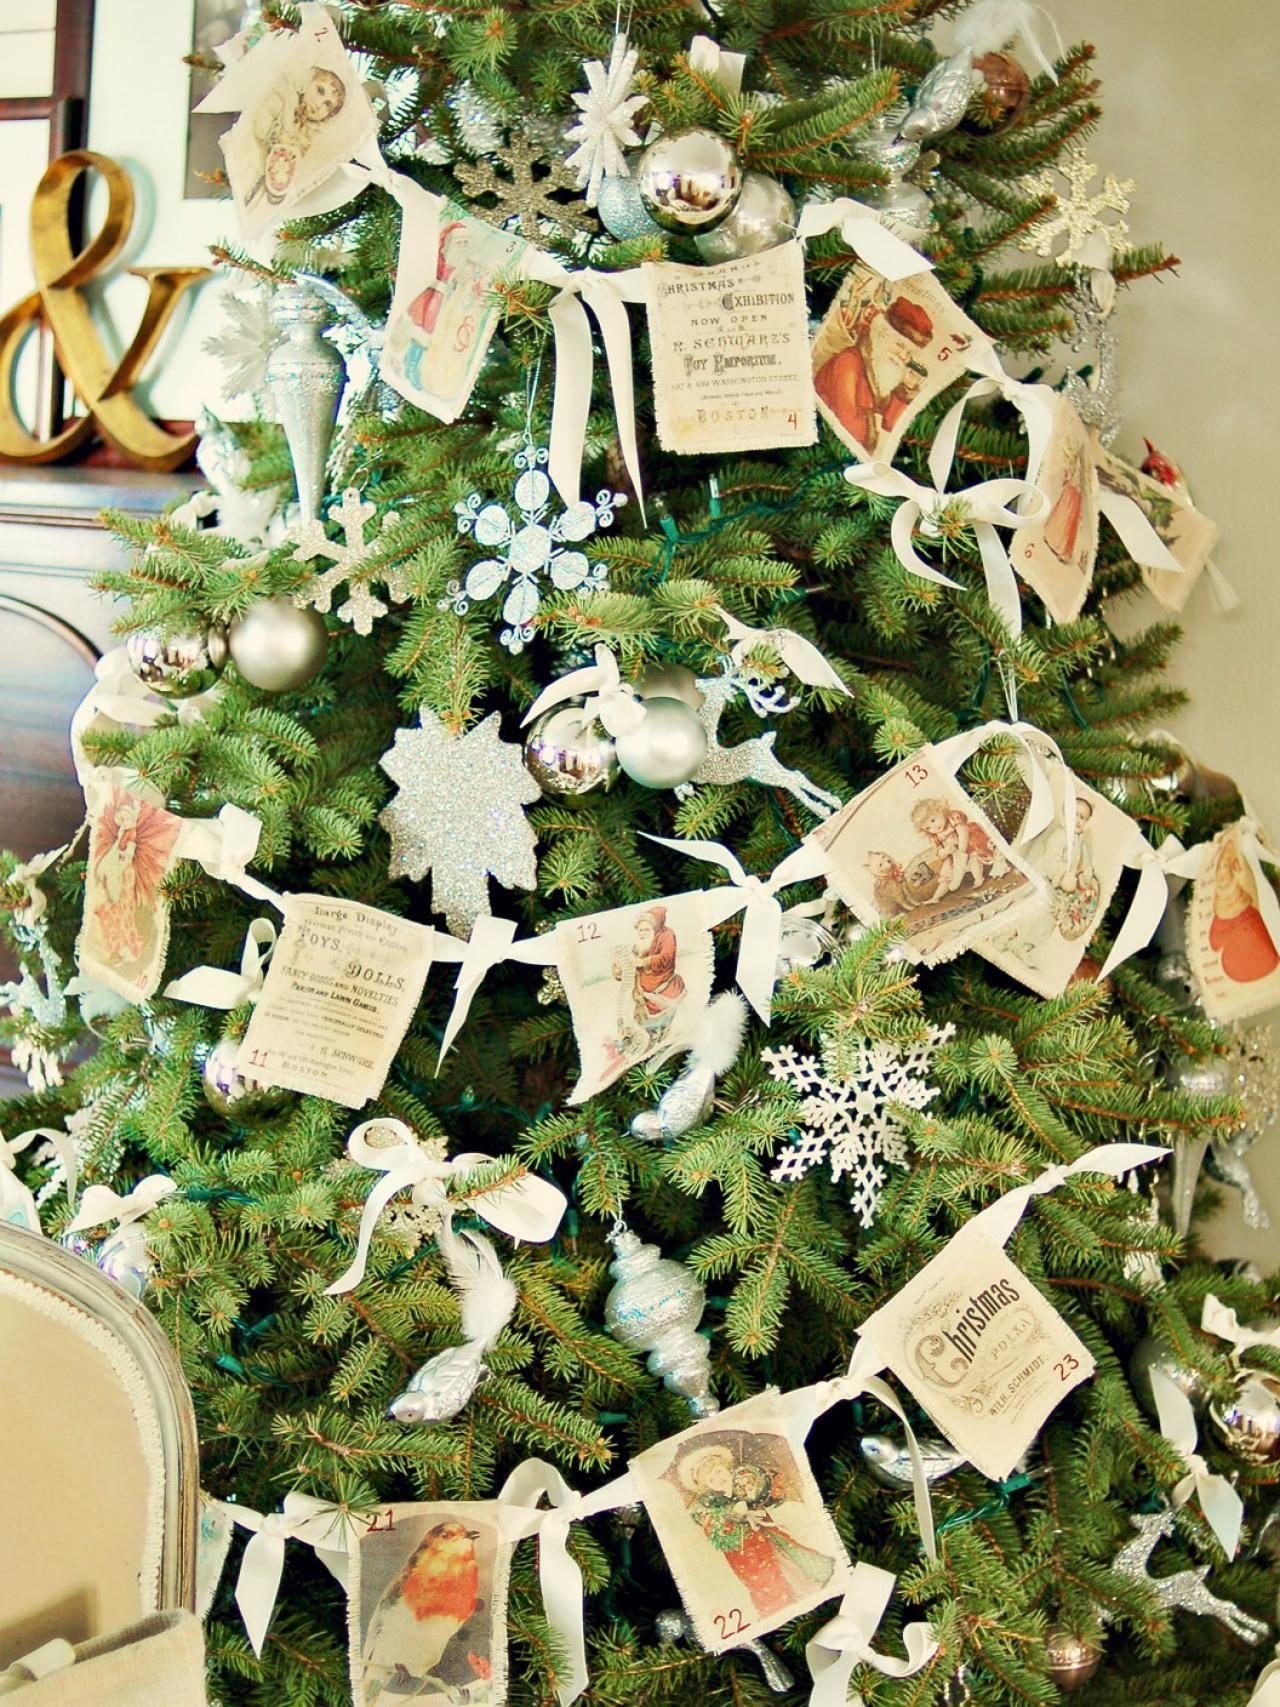 65 Handmade Christmas Decorating Ideas - Easy Crafts And Homemade